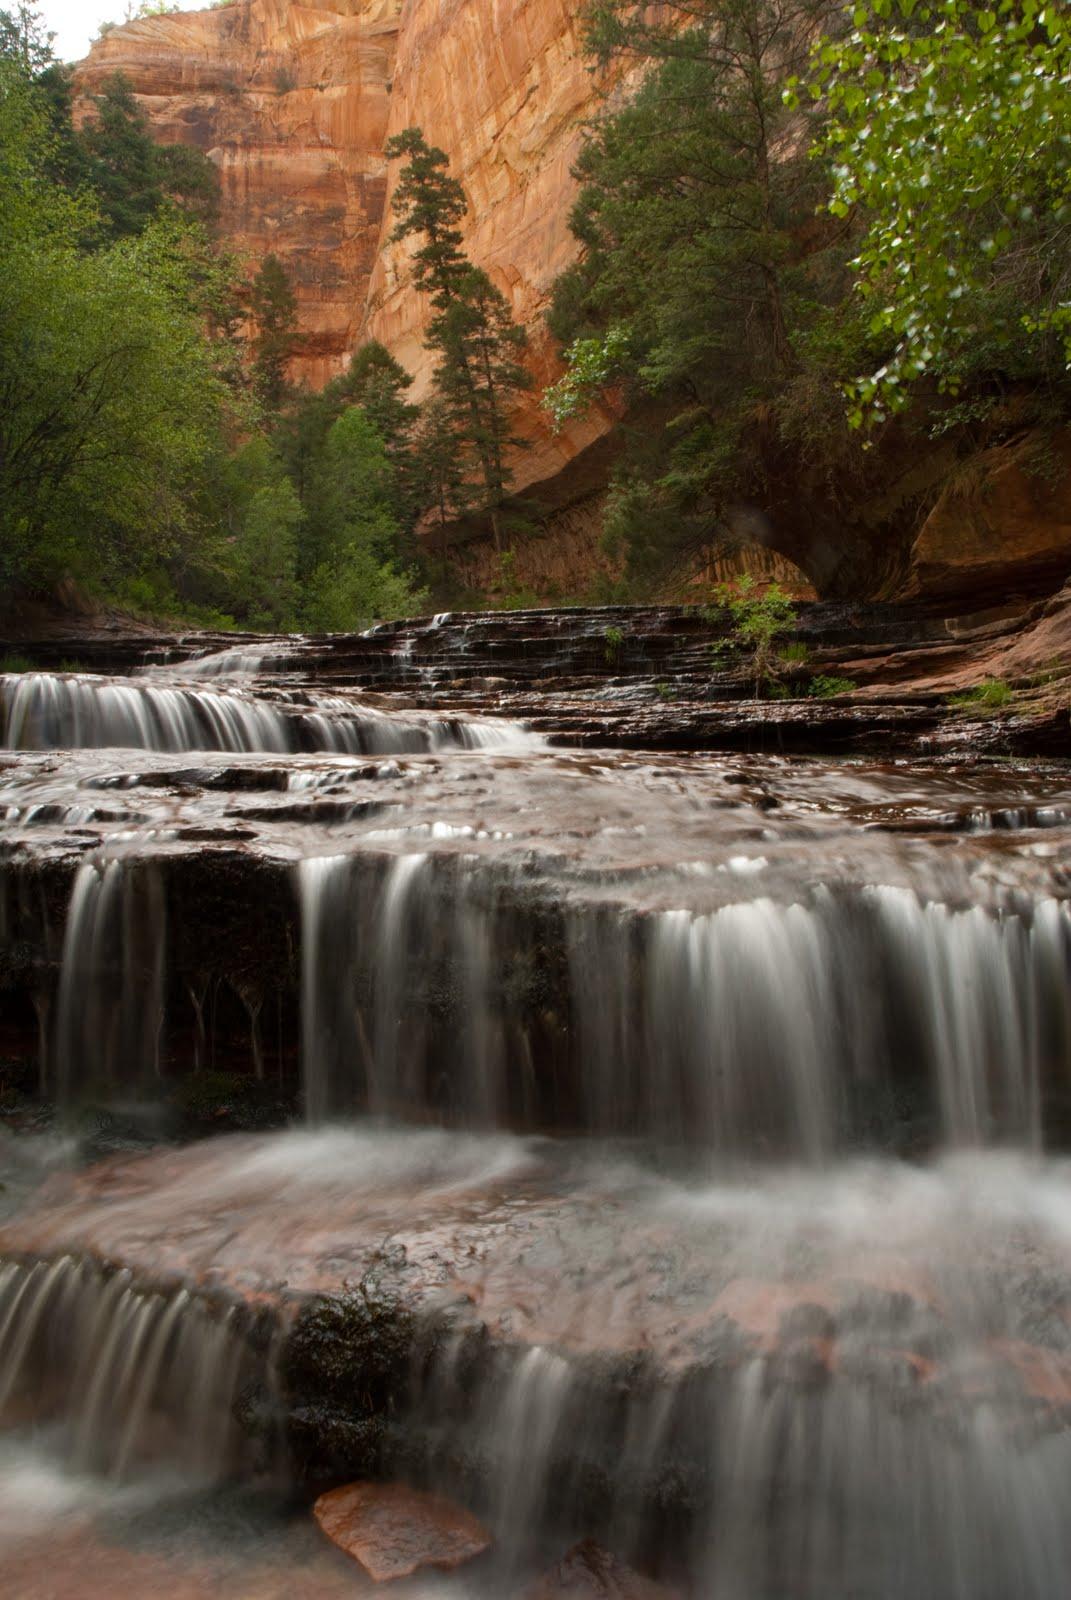 [North+Creek+Cascades]